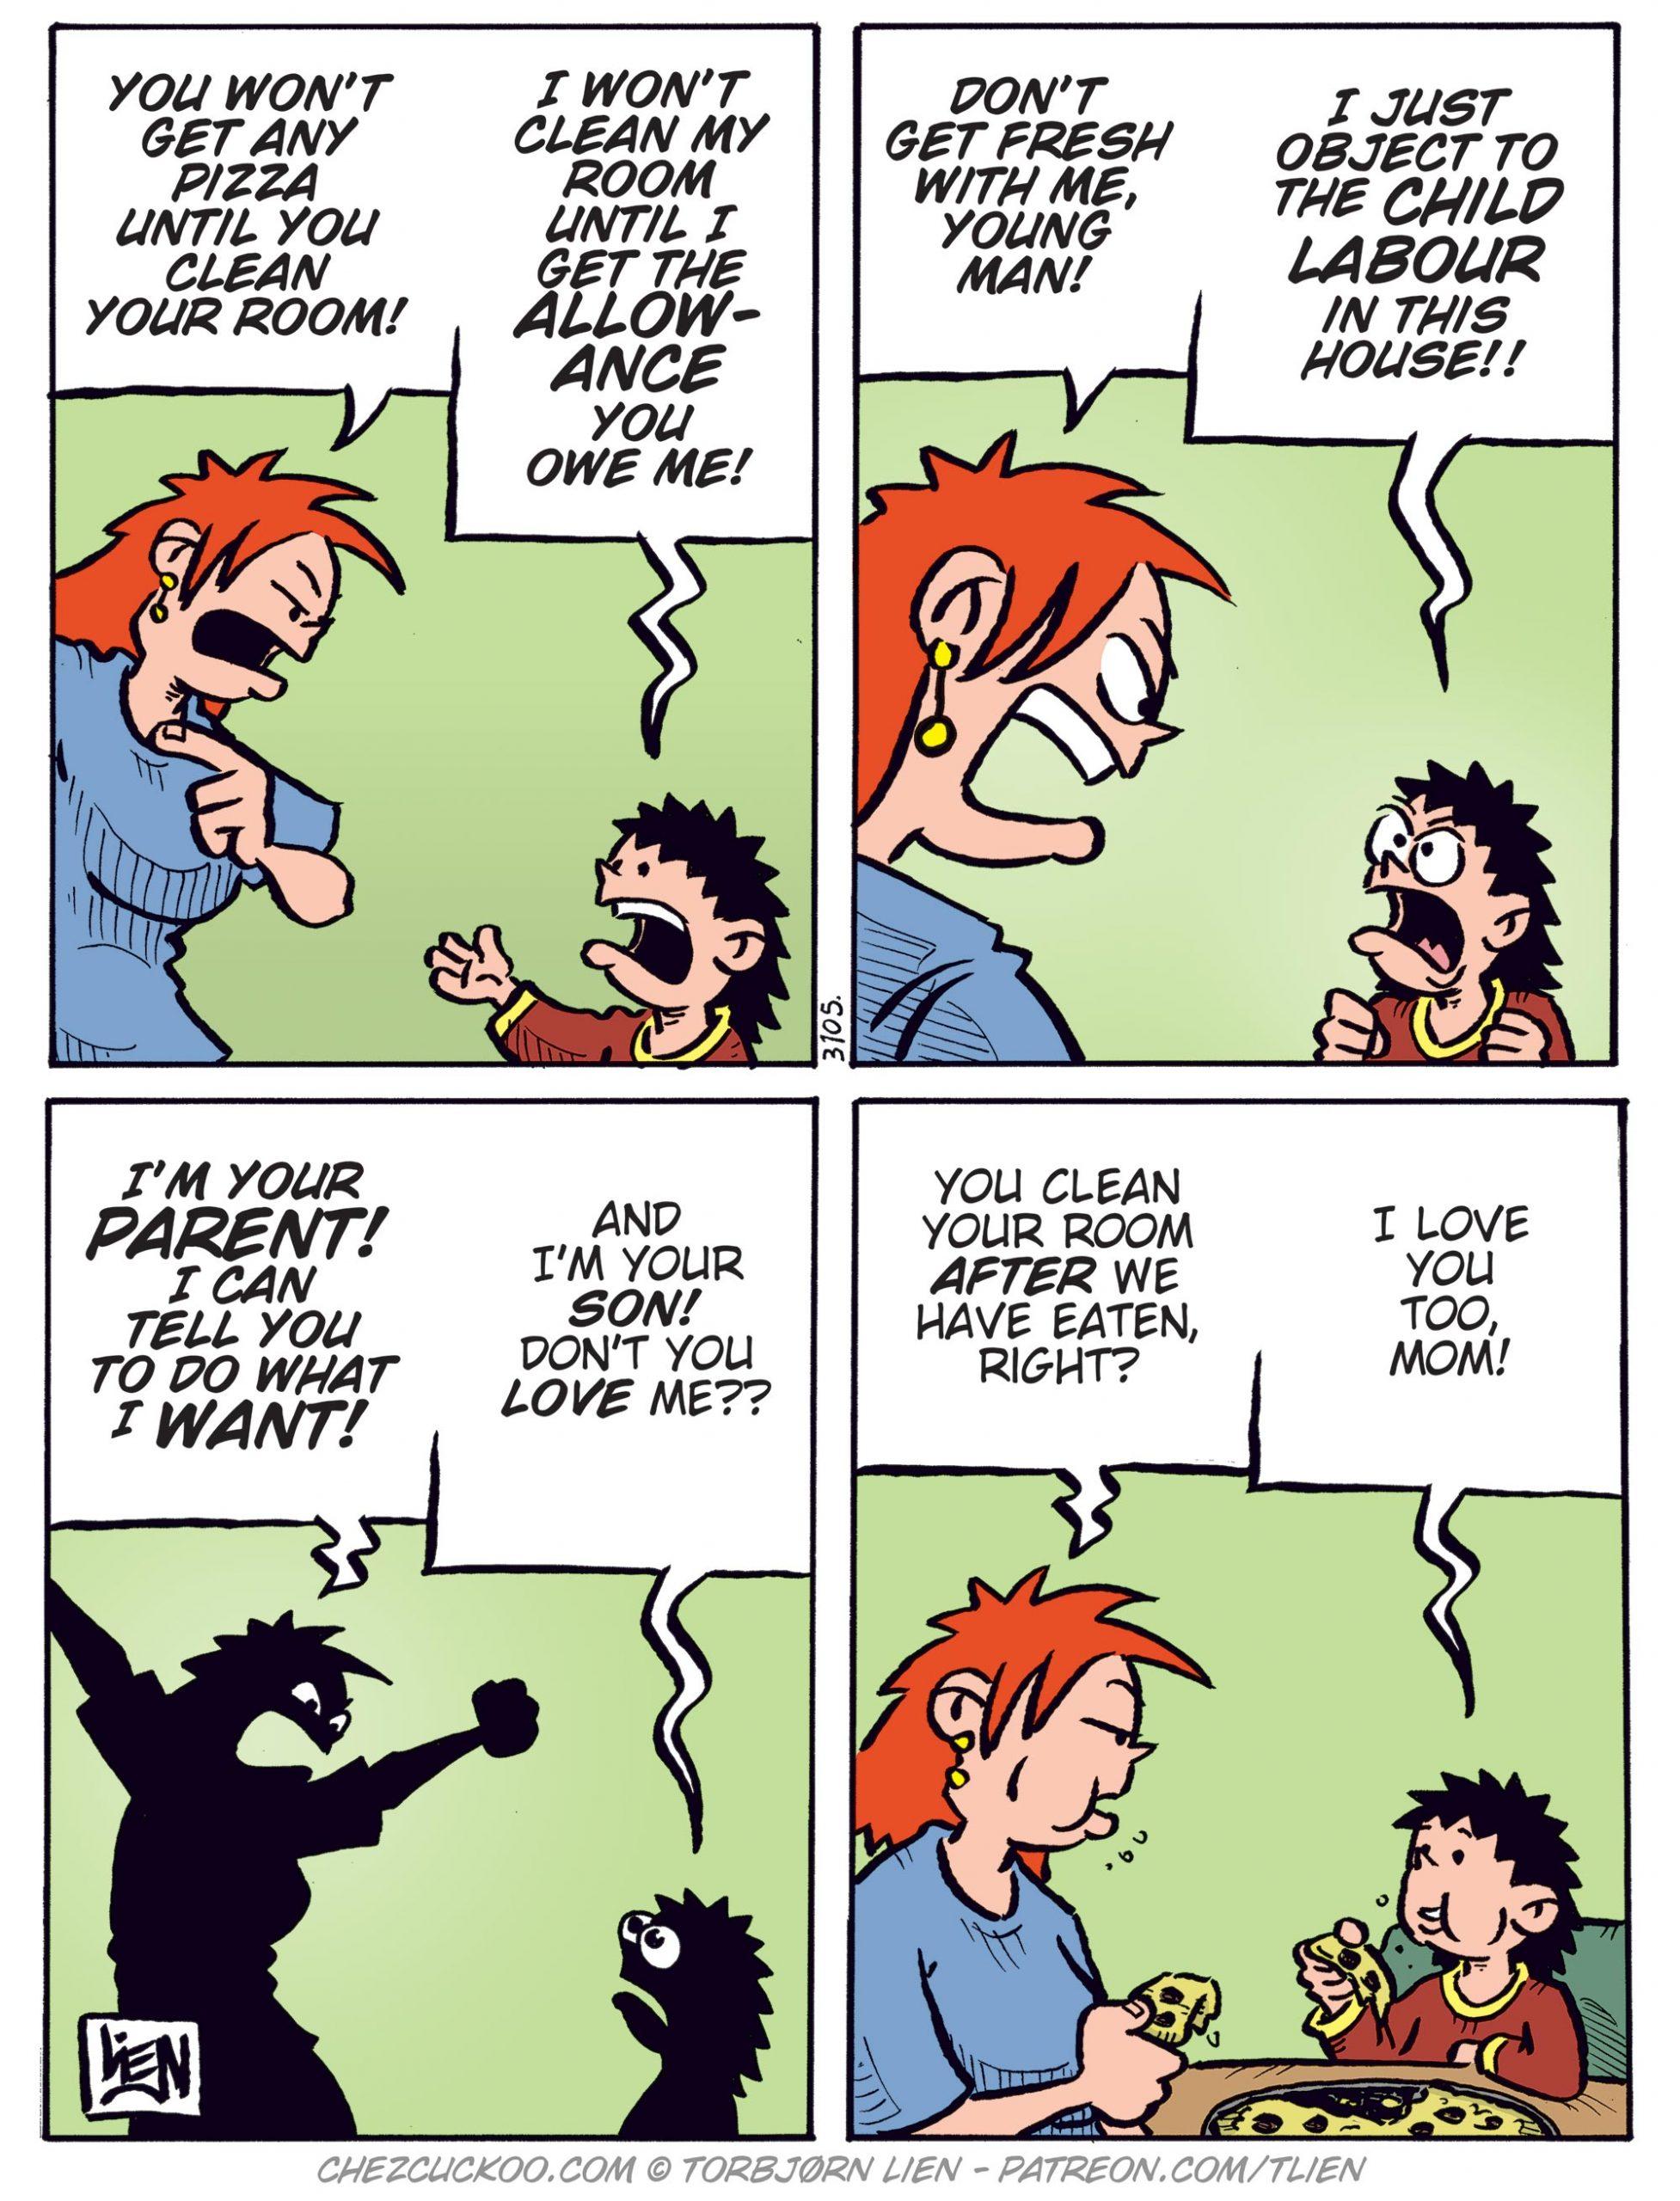 Parenting trouble